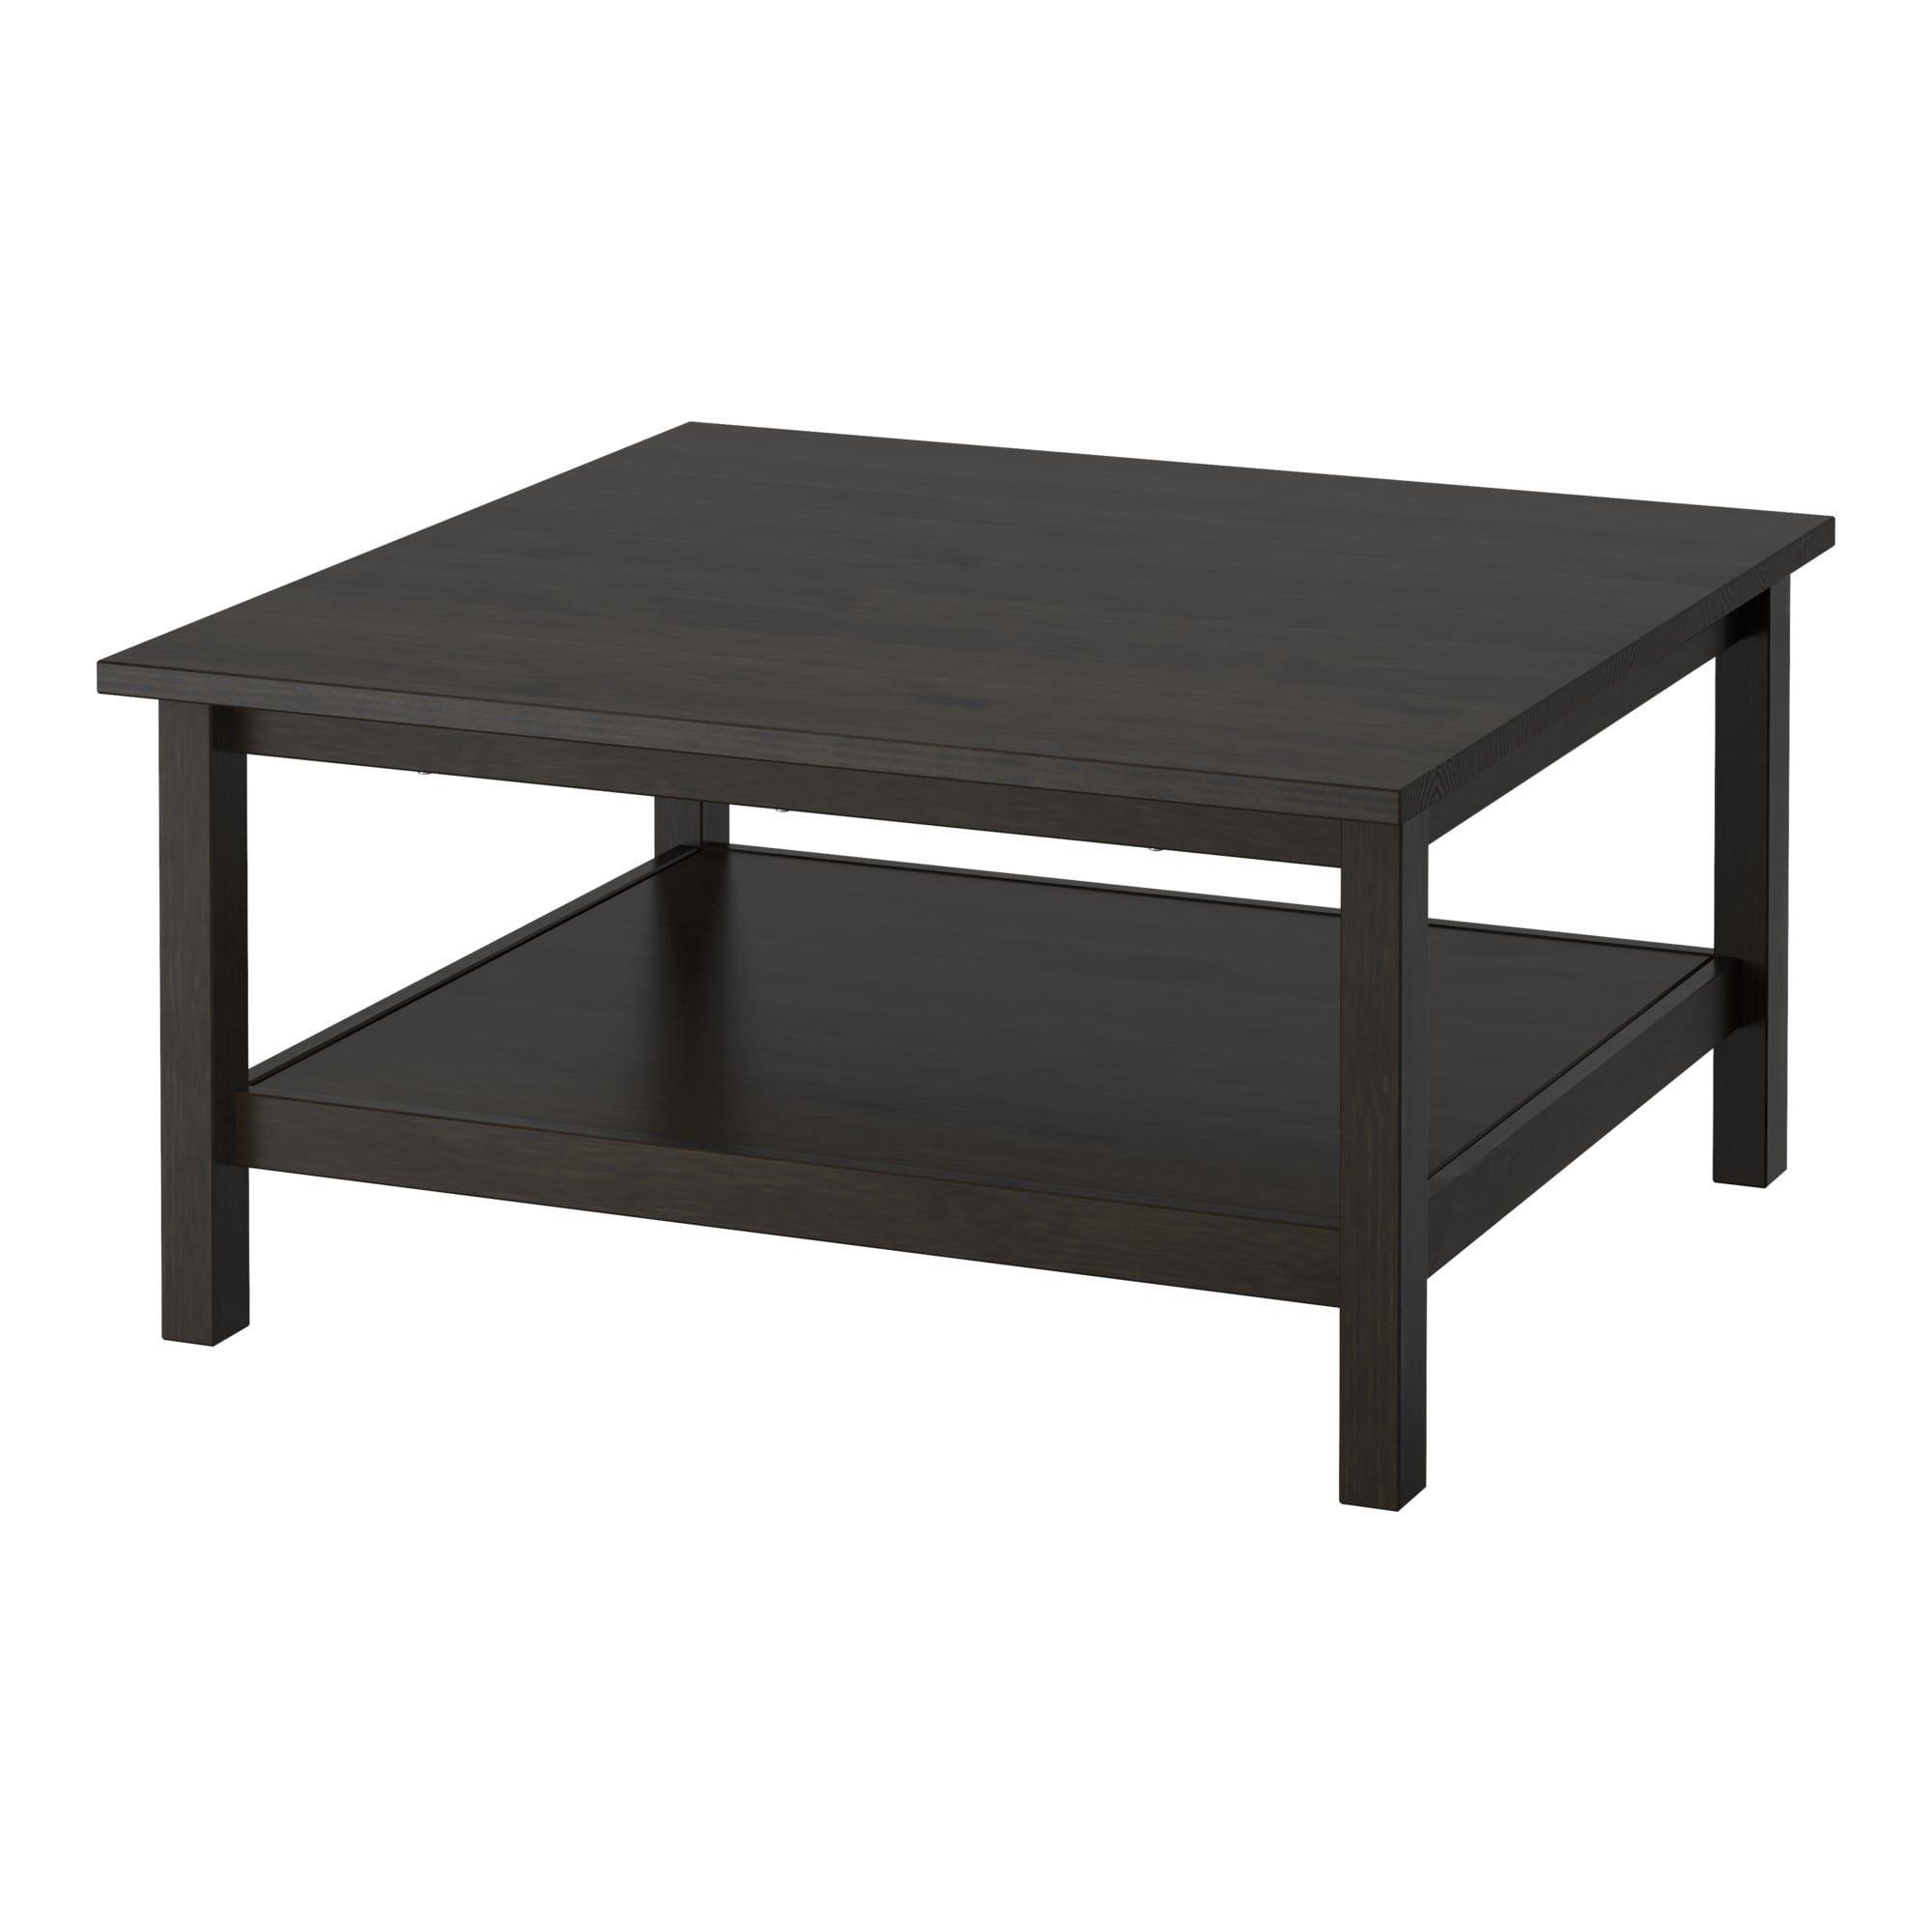 Ikea Coffee Table Outdoor: IKEA - HEMNES Coffee Table Black-brown